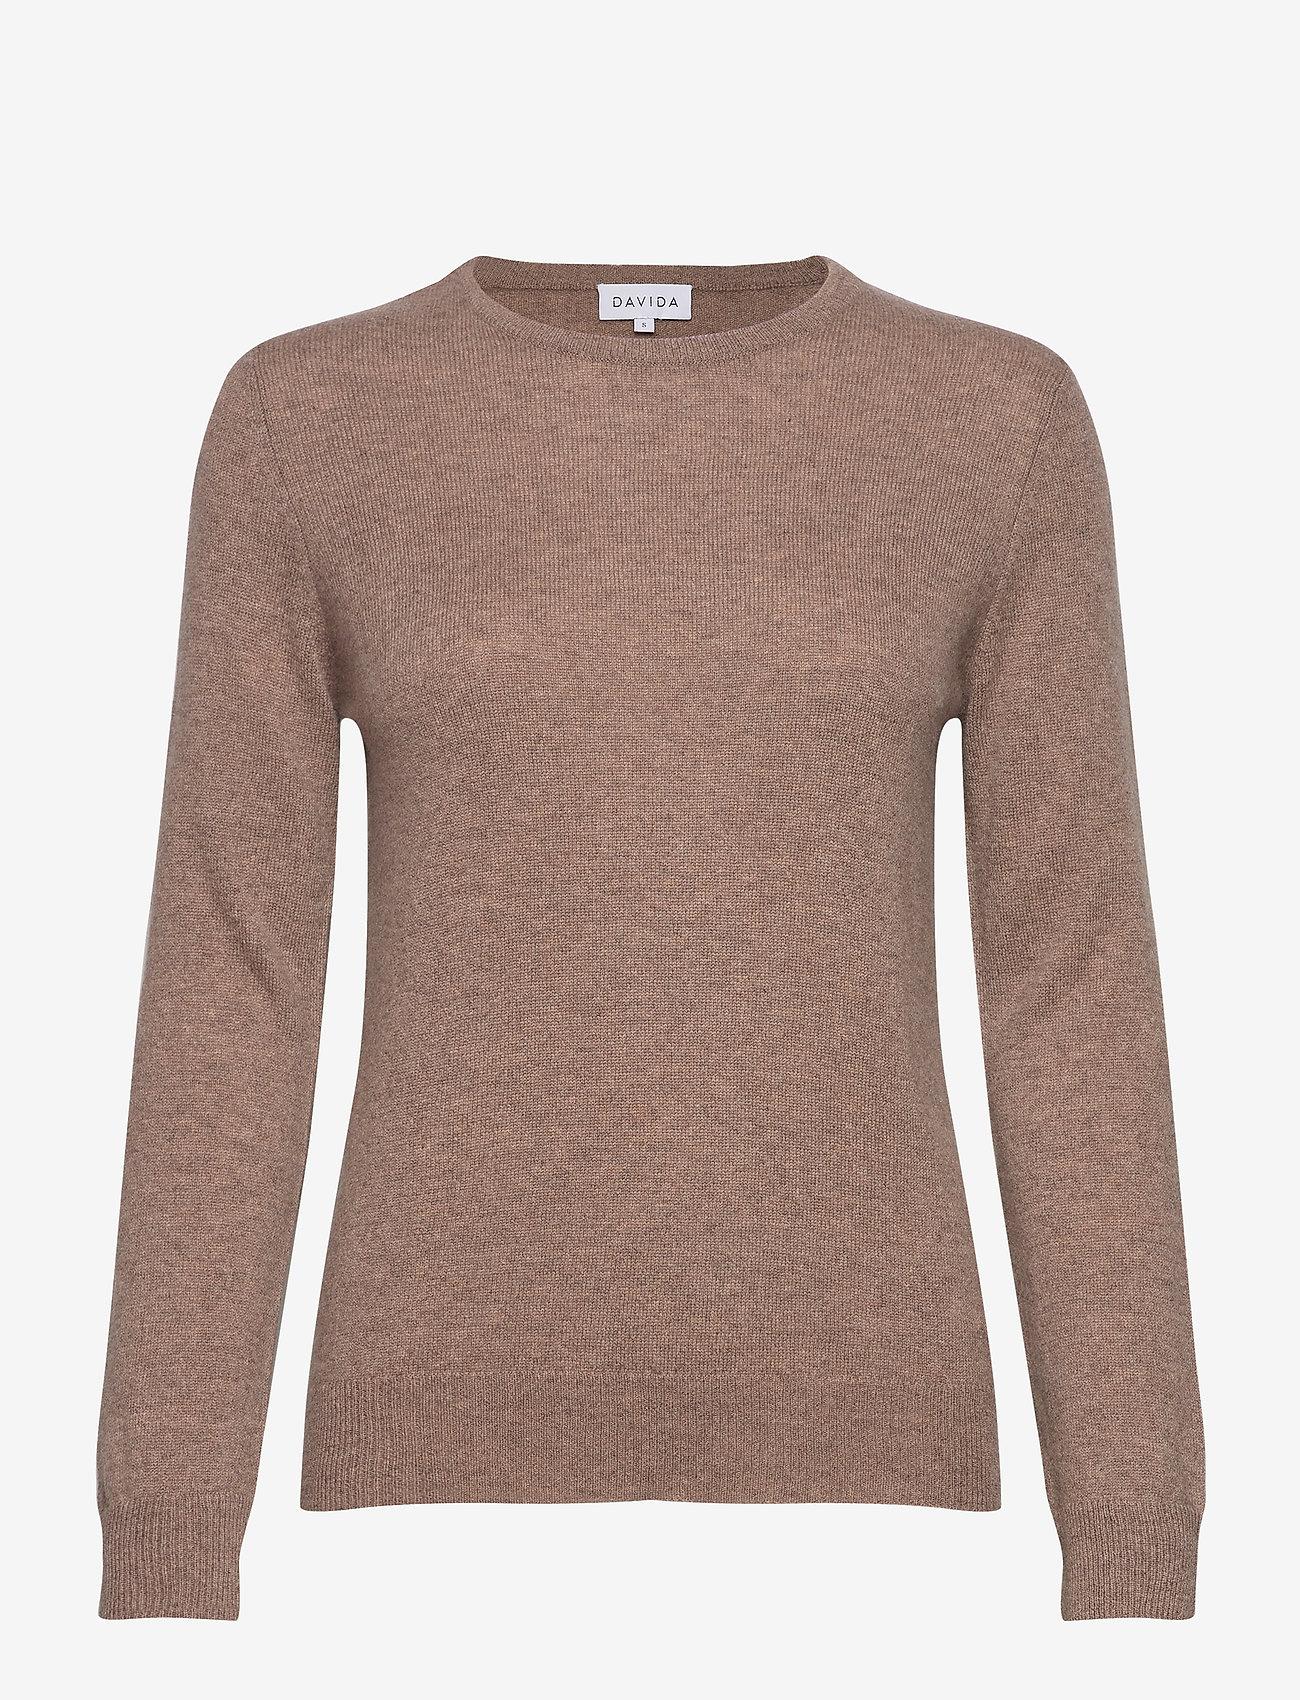 Davida Cashmere - Basic sweater - sweaters - mink - 1